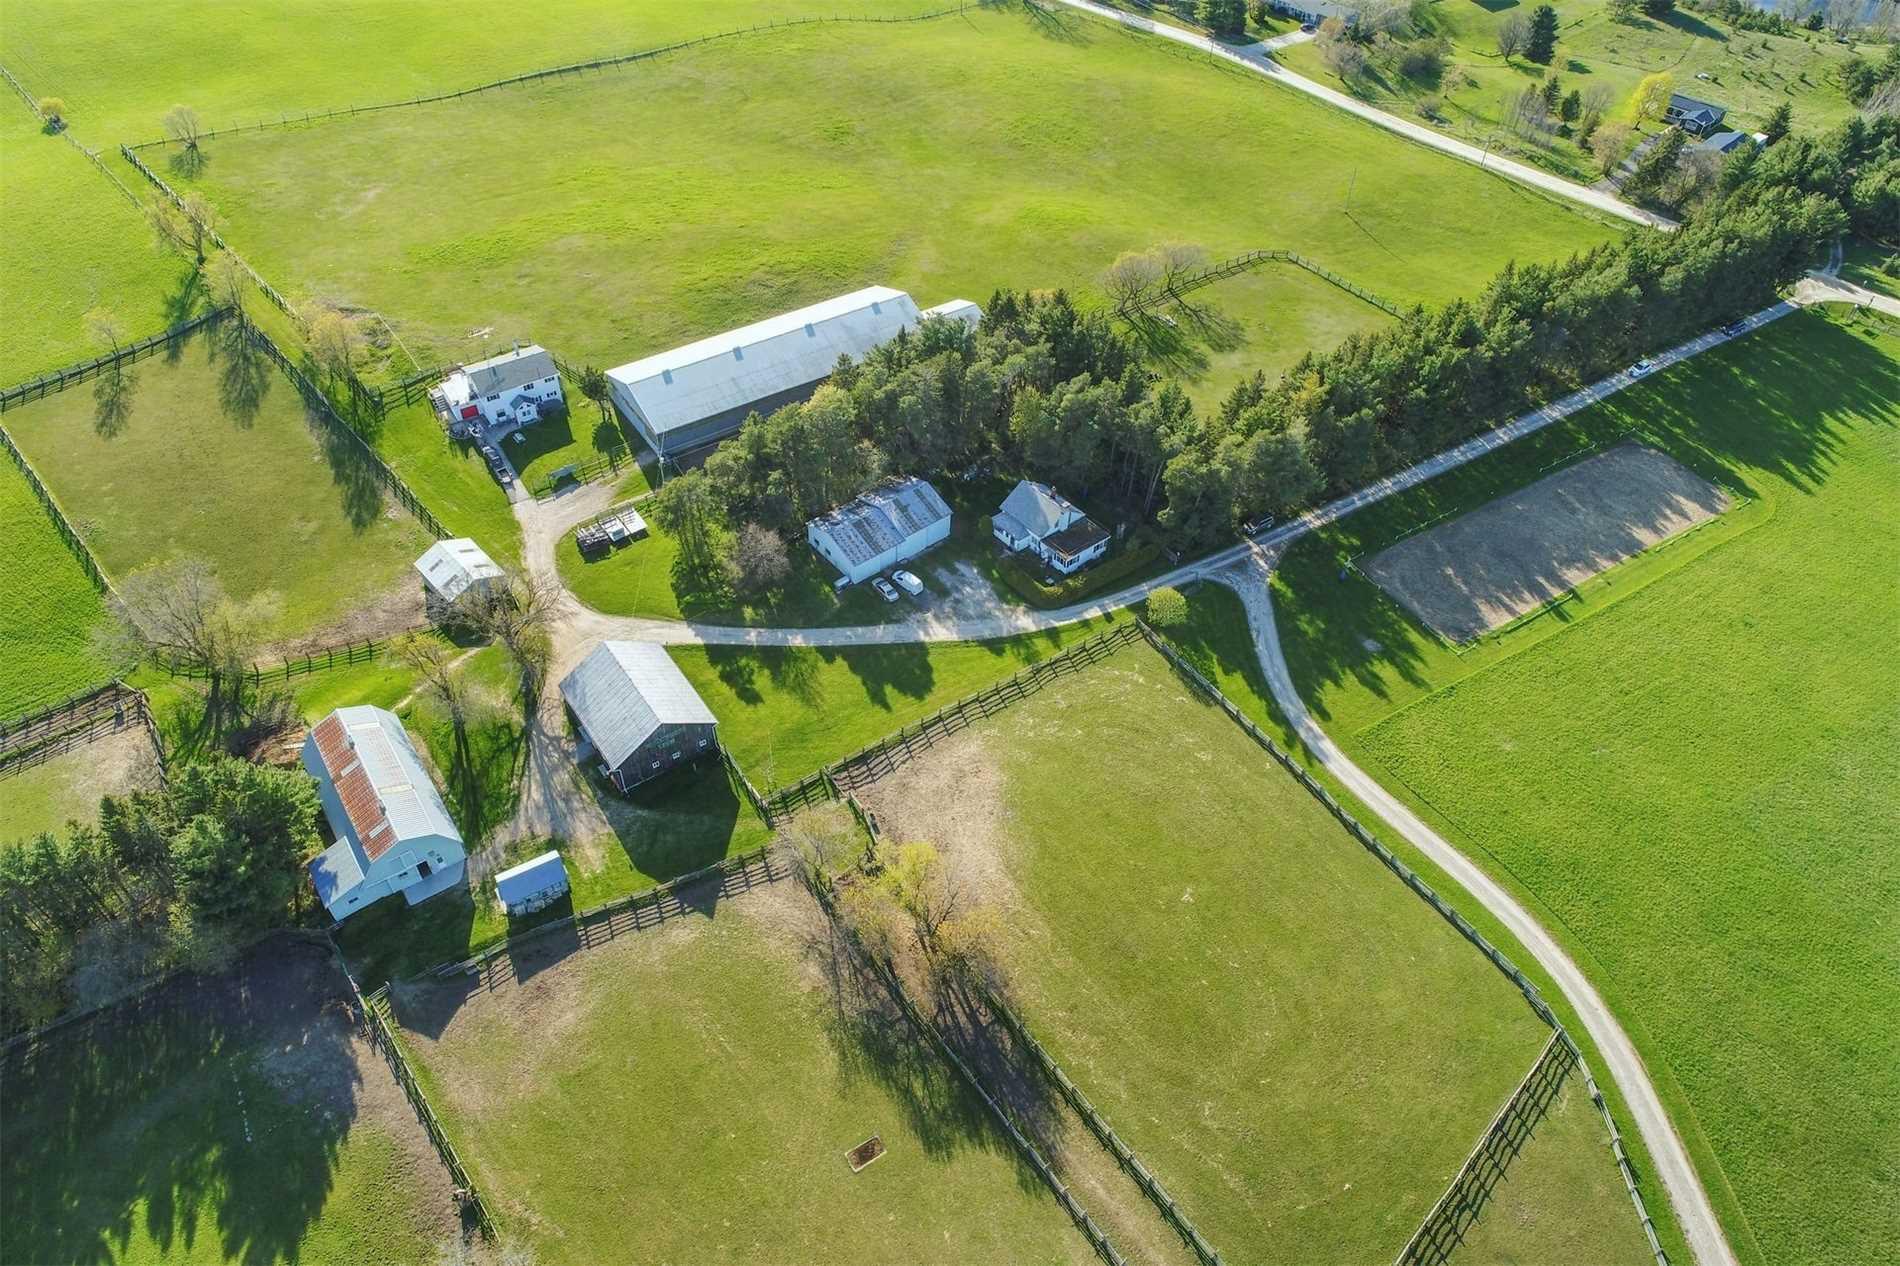 Main Photo: 348536 15 Sideroad in Mono: Rural Mono Property for sale : MLS®# X4465634